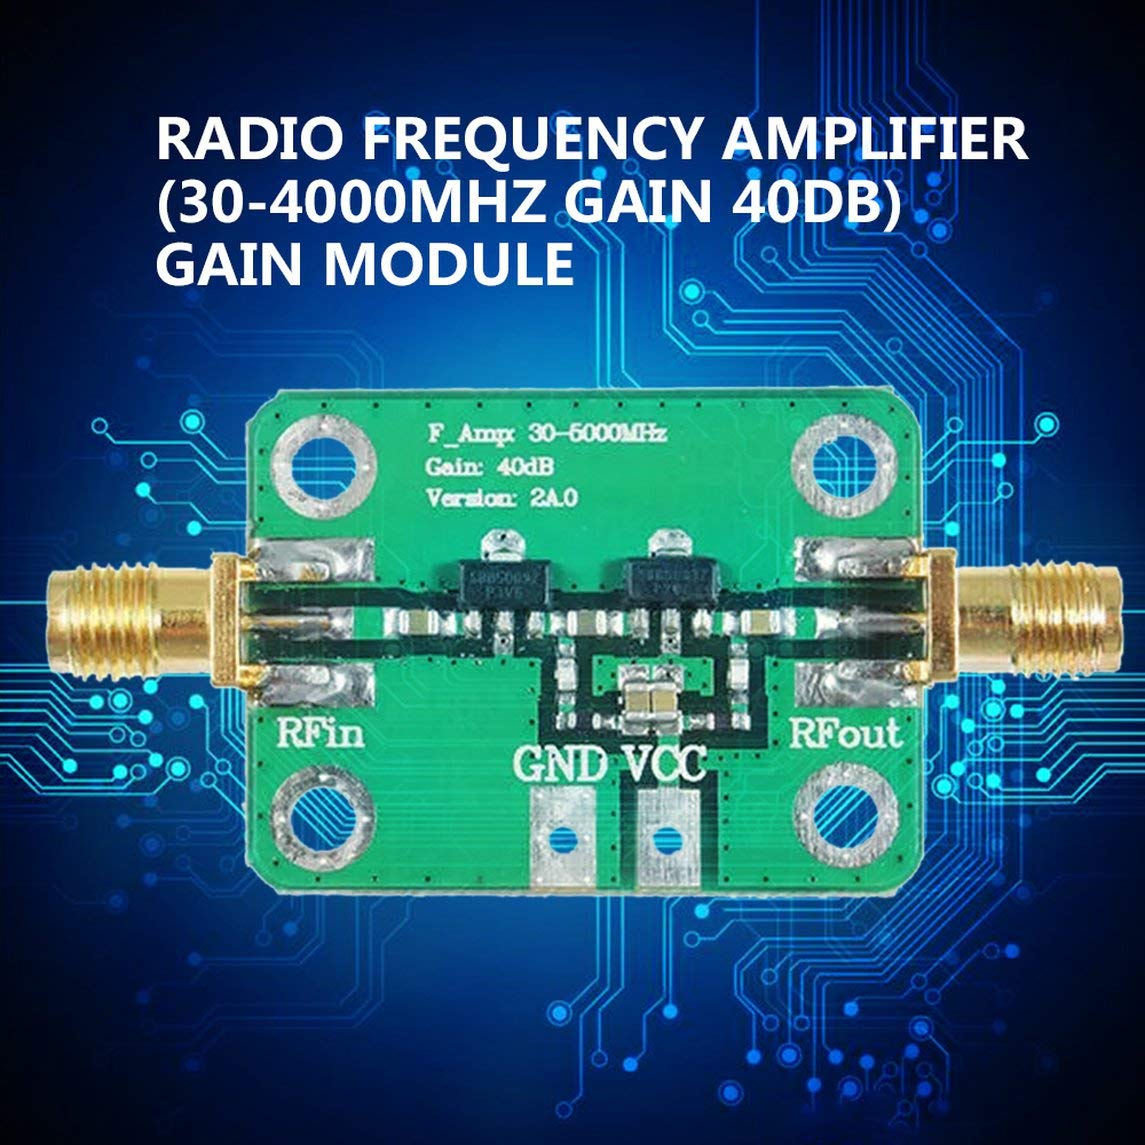 YXTFN 30-4000Mhz 40Db Gain Rf Broadband Amplifier Module for Fm Hf VHF/Uhf 50Ω UBS by Magicalworld (Image #2)